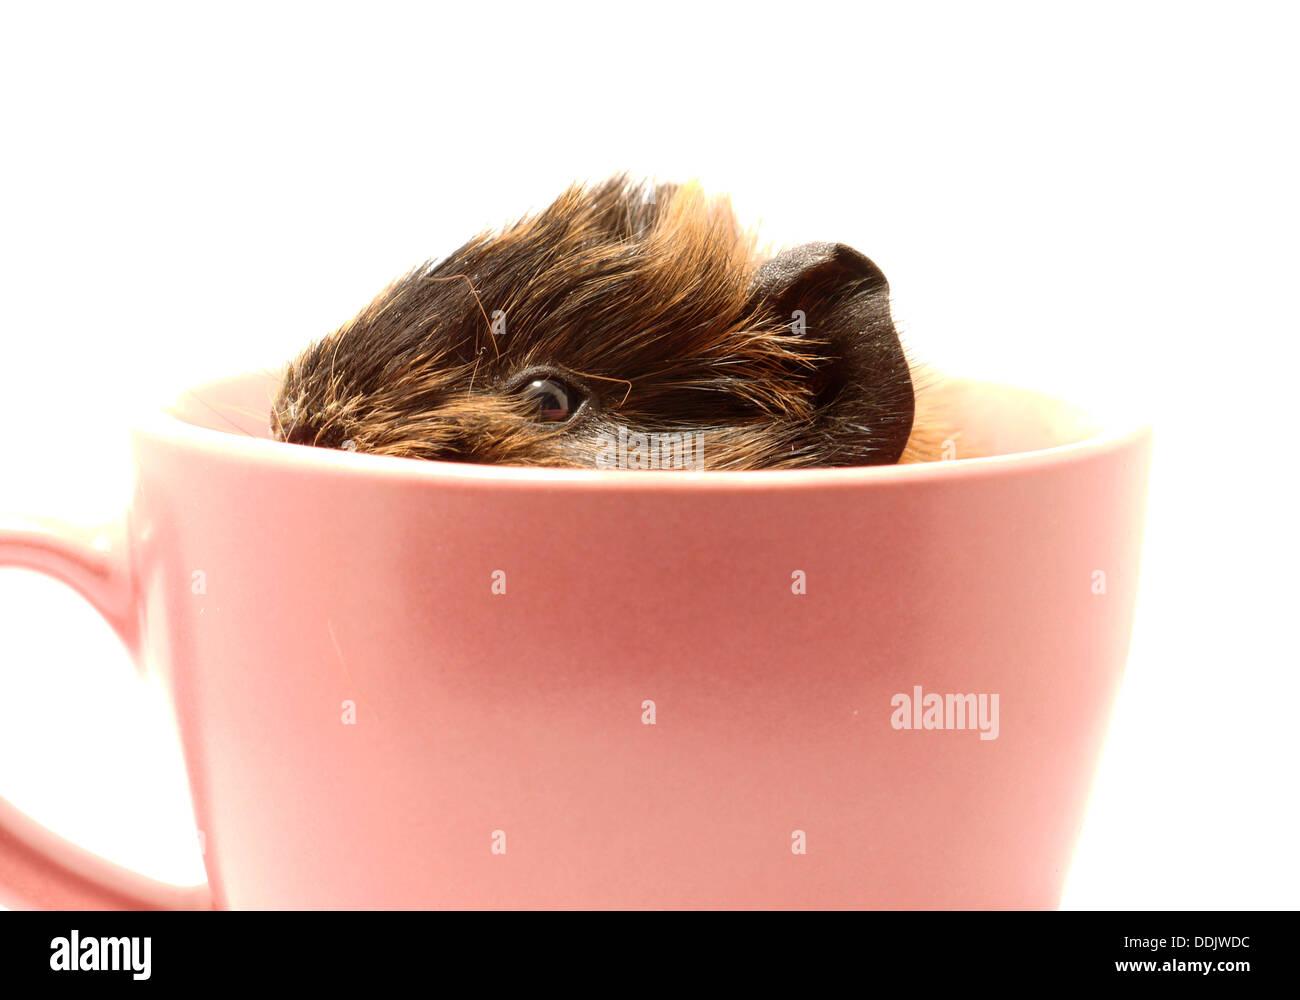 Hamster Funny Stockfotos & Hamster Funny Bilder - Seite 22 - Alamy